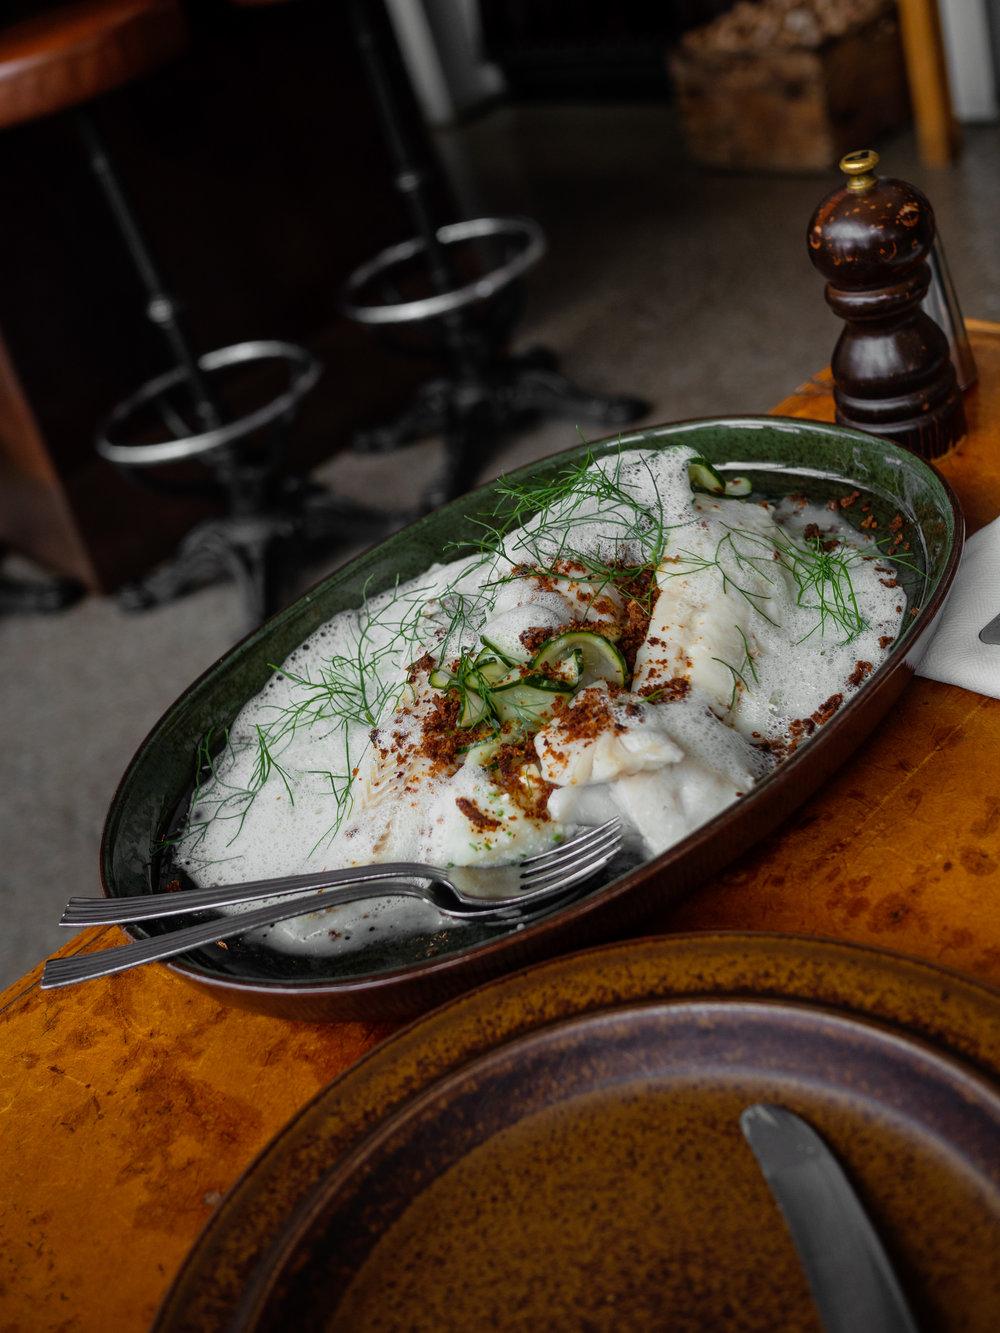 The phenomenal halibut meets potato mash and foam dish at Oaxen Krog. Address: Beckholmsbron 26, 115 21 Stockholm, Sweden Phone: +46 8 551 531 05